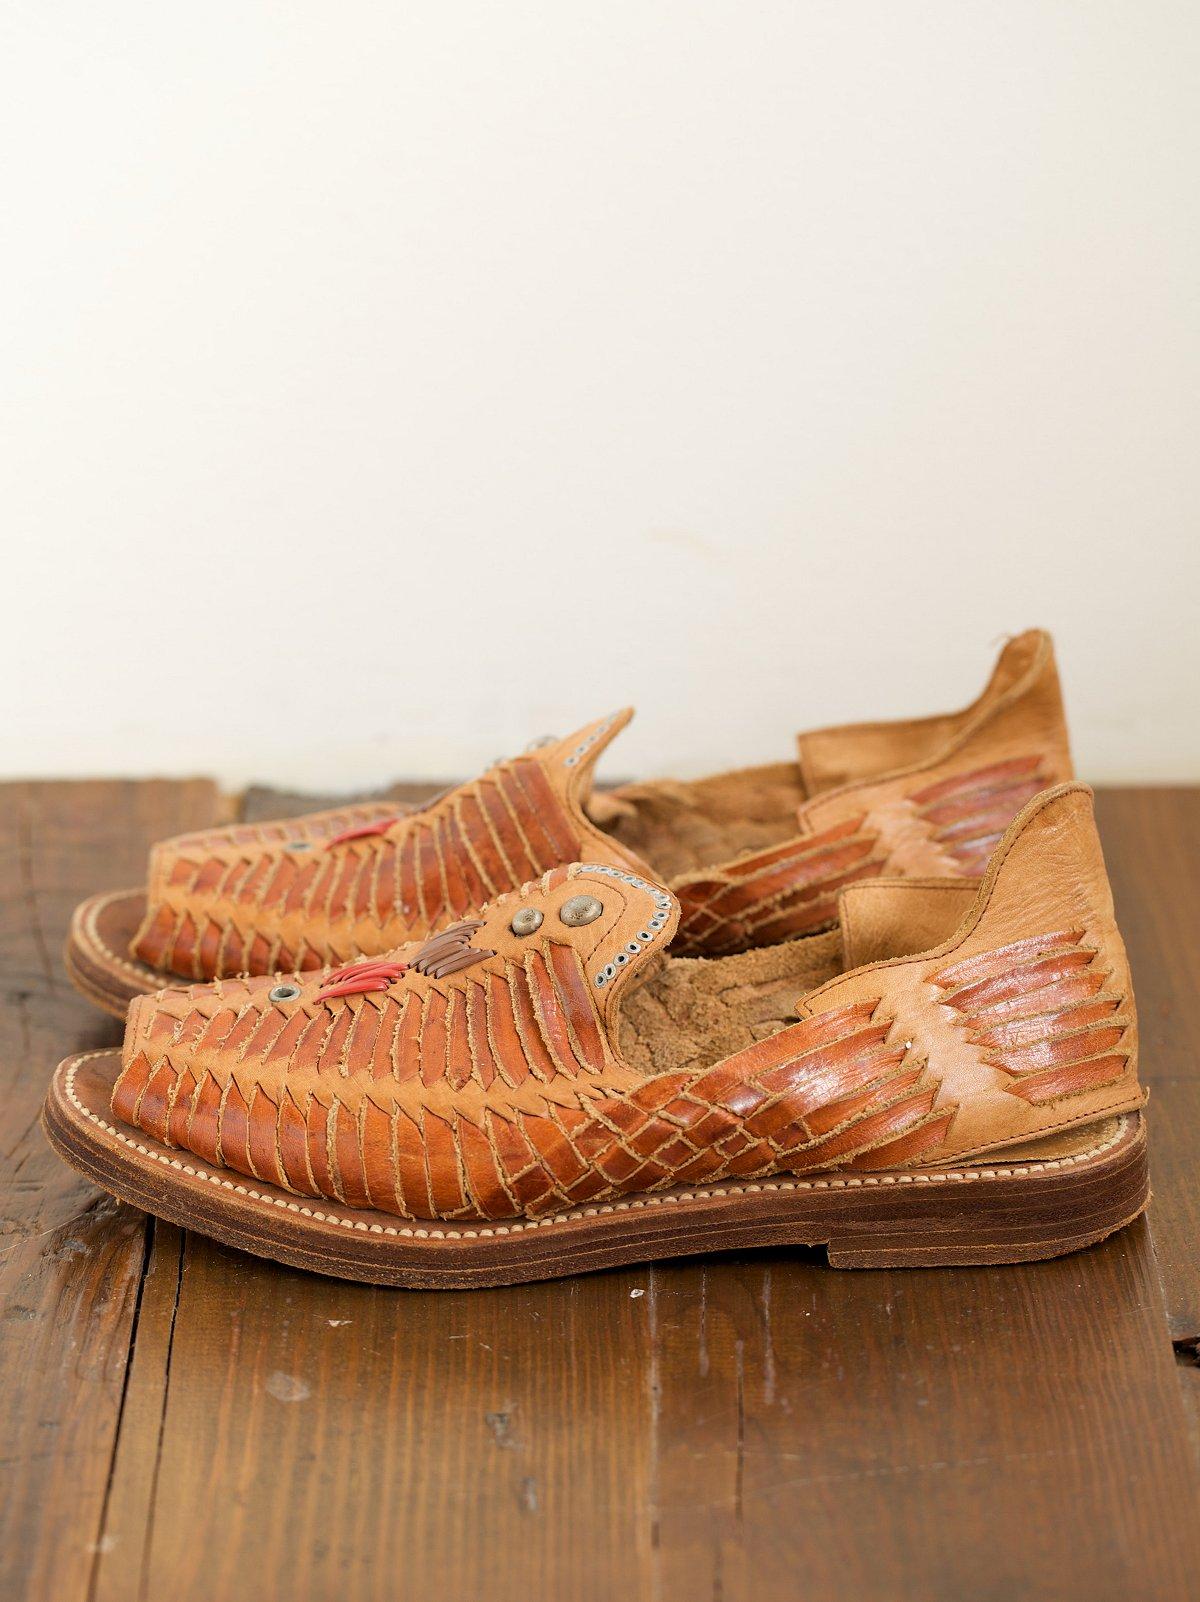 Handmade Woven Leather Slip Ons